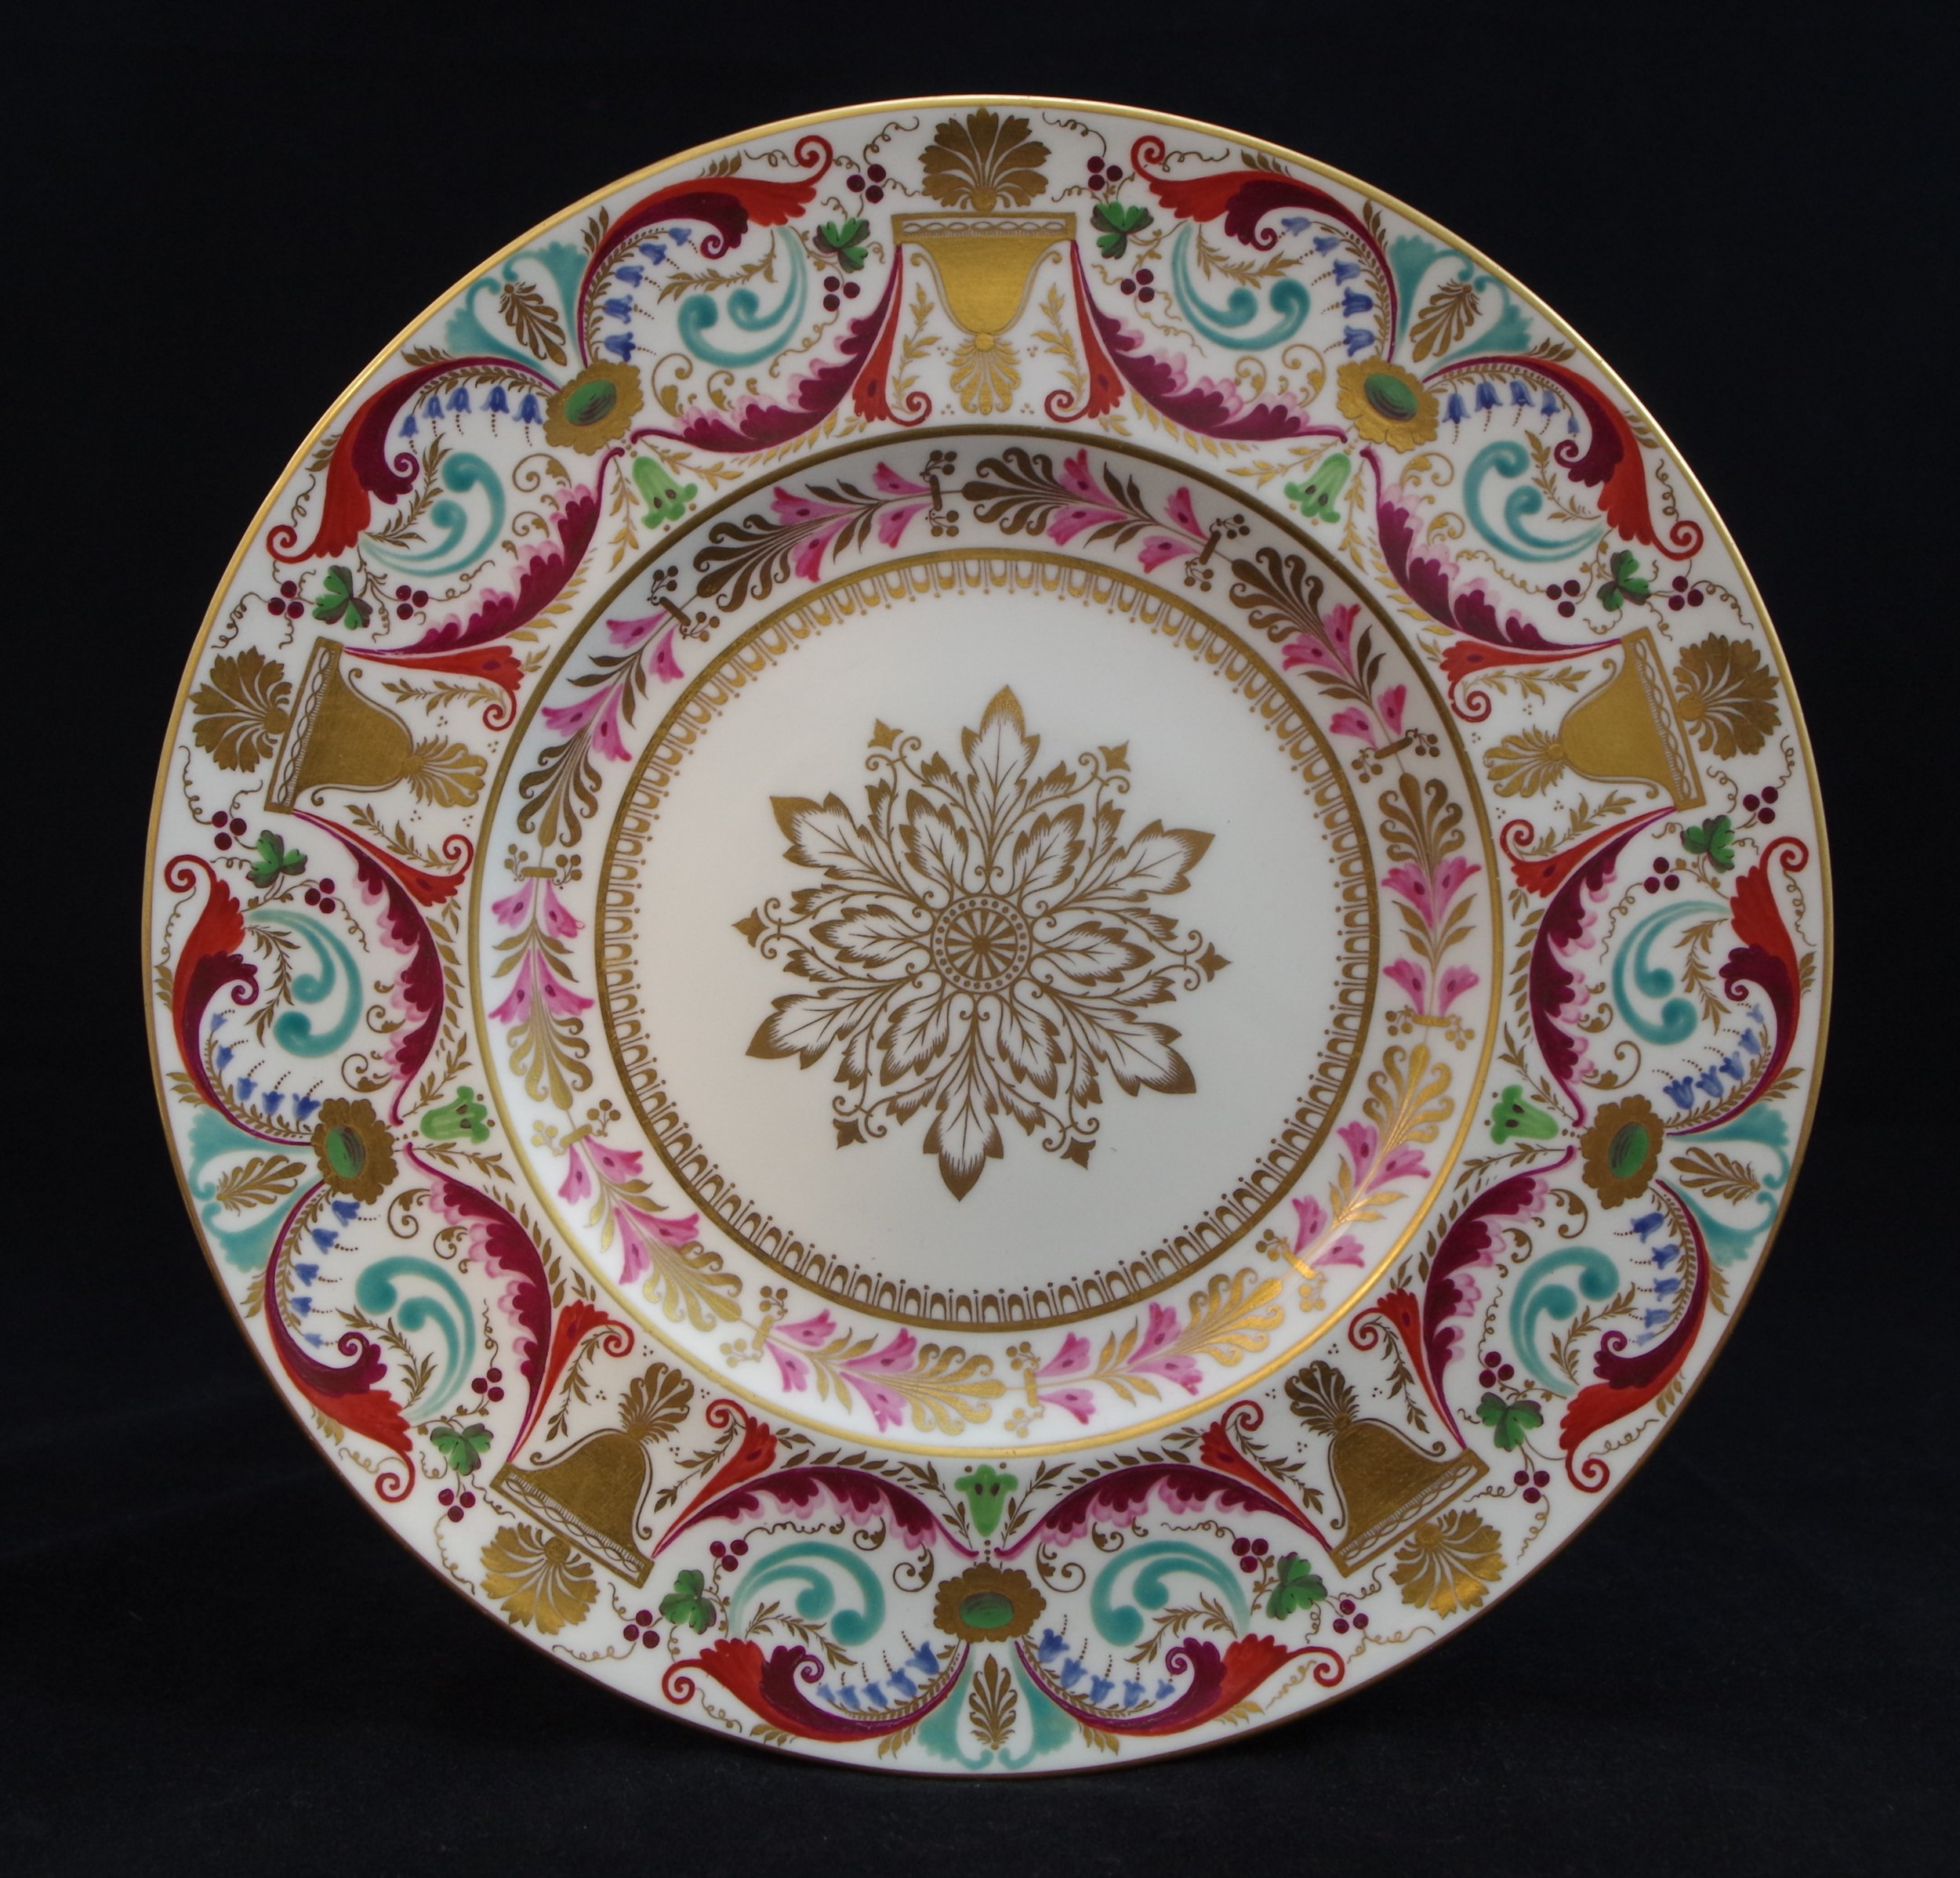 royal-crown-derby-unknown-pattern-number